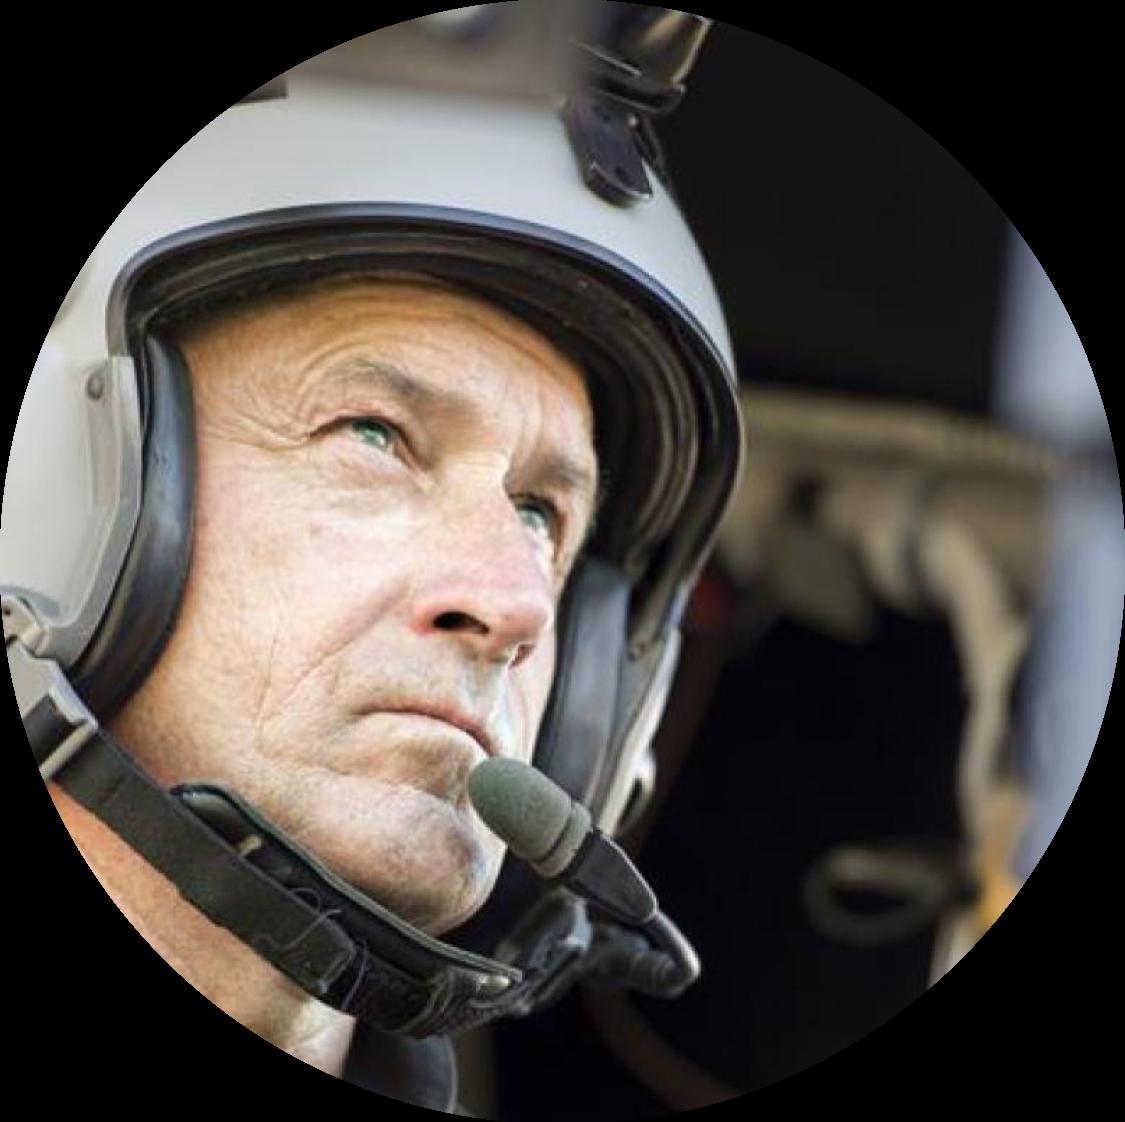 andre-borschberg-pilote-wechamp